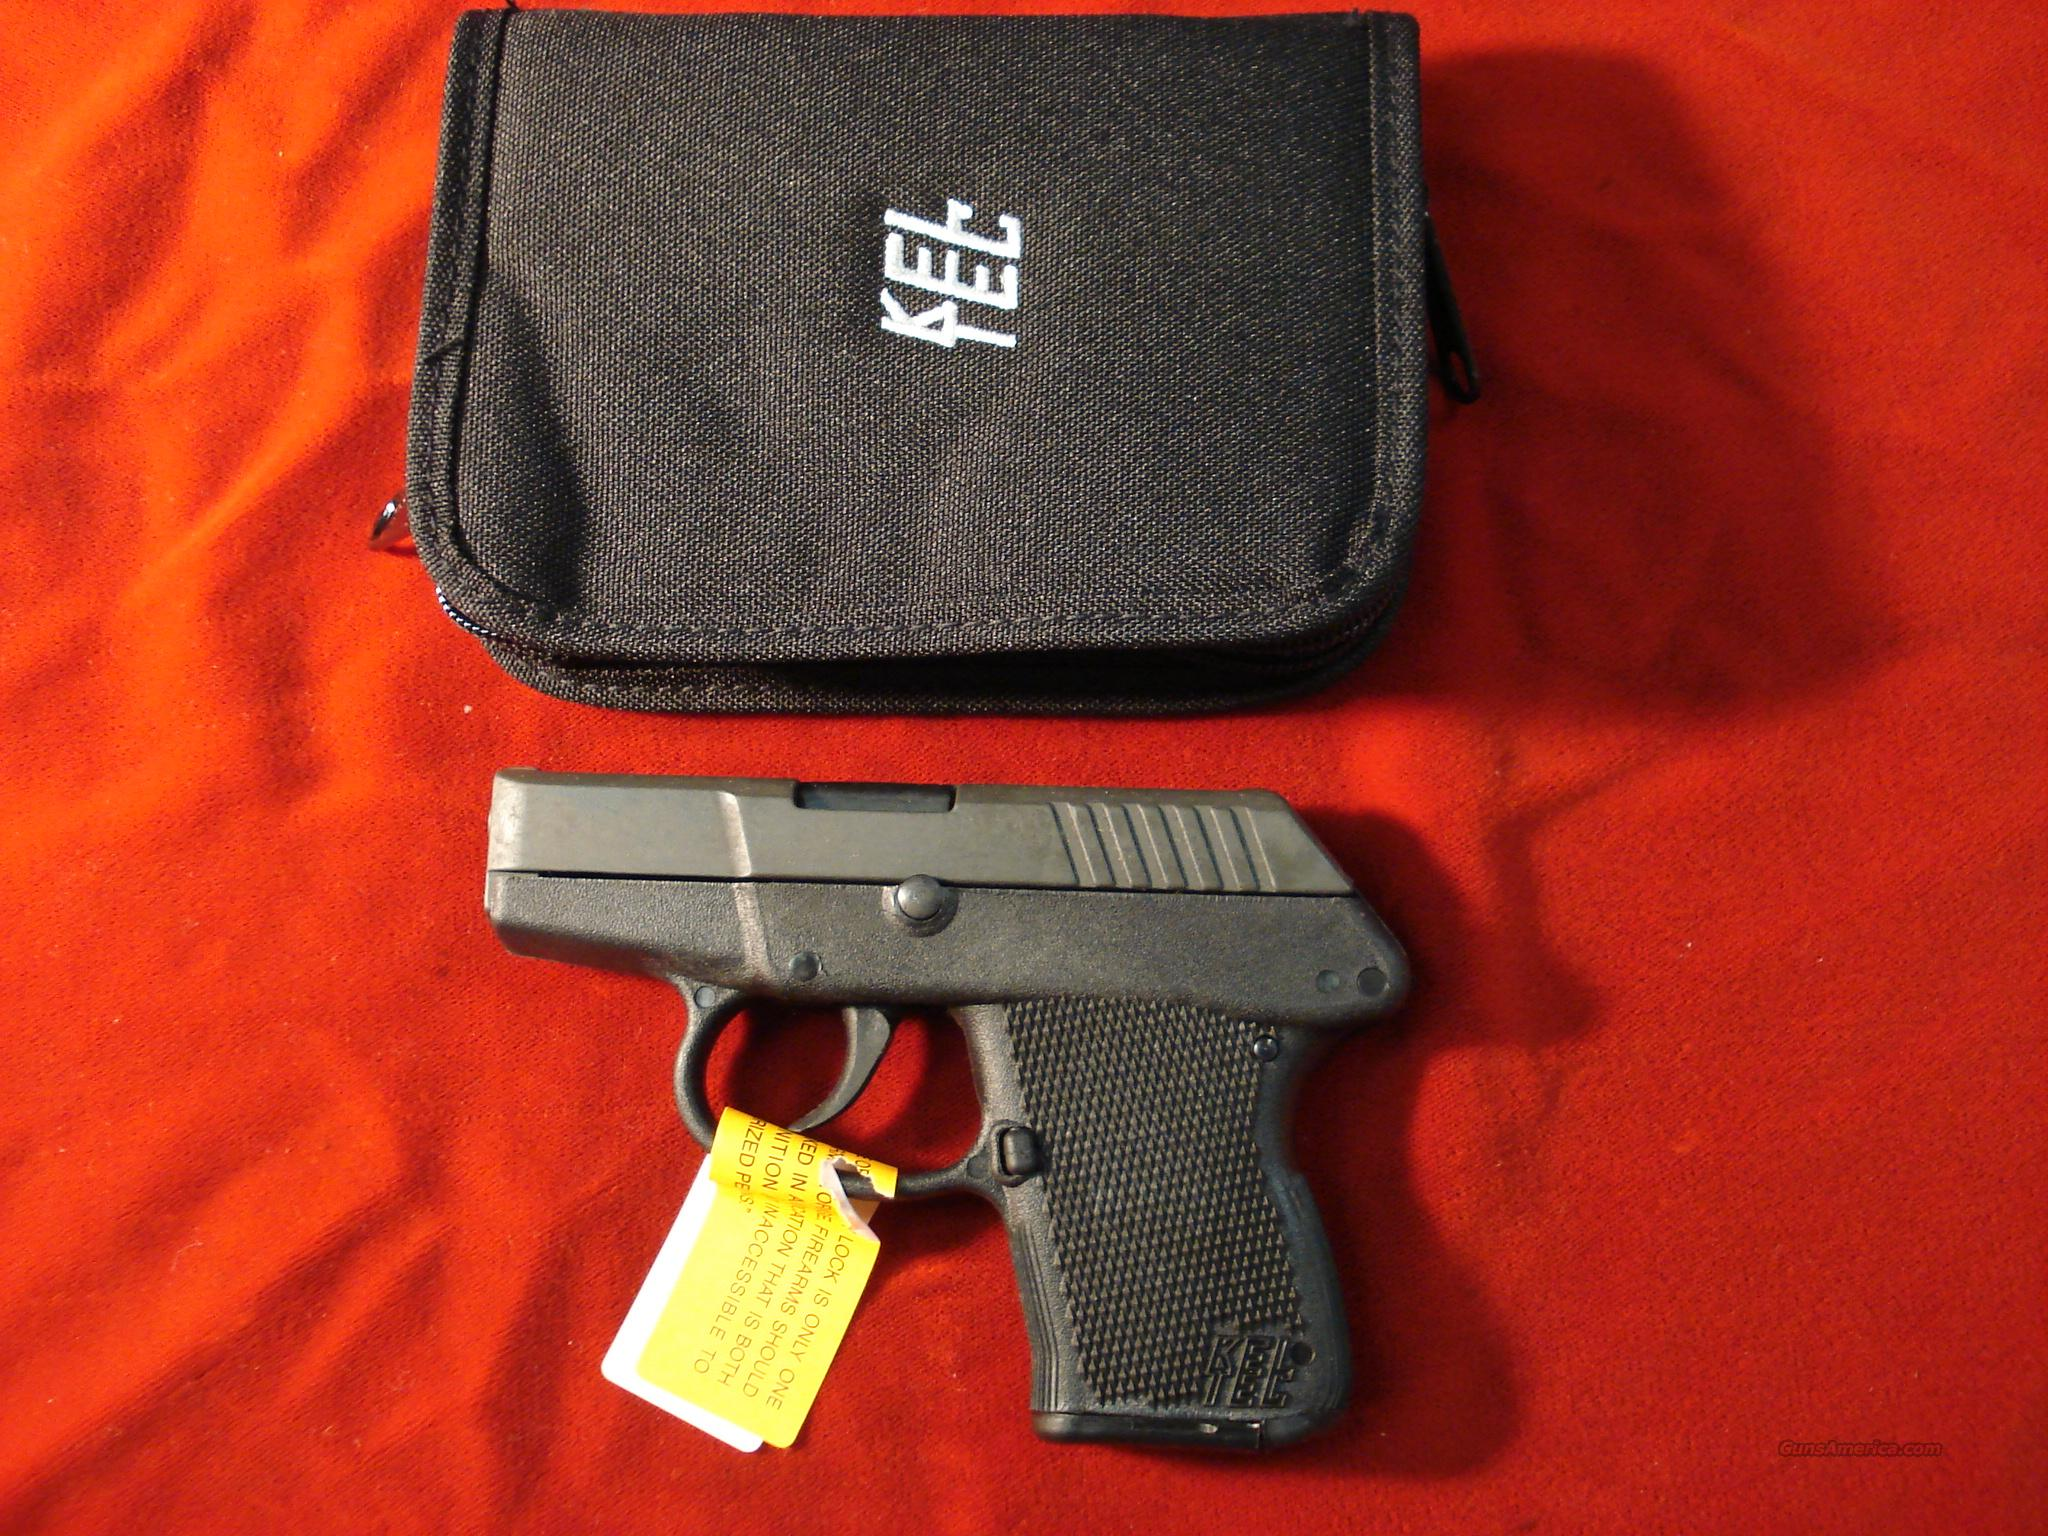 KEL-TEC P-3AT PARKERIZED  Guns > Pistols > Kel-Tec Pistols > Pocket Pistol Type